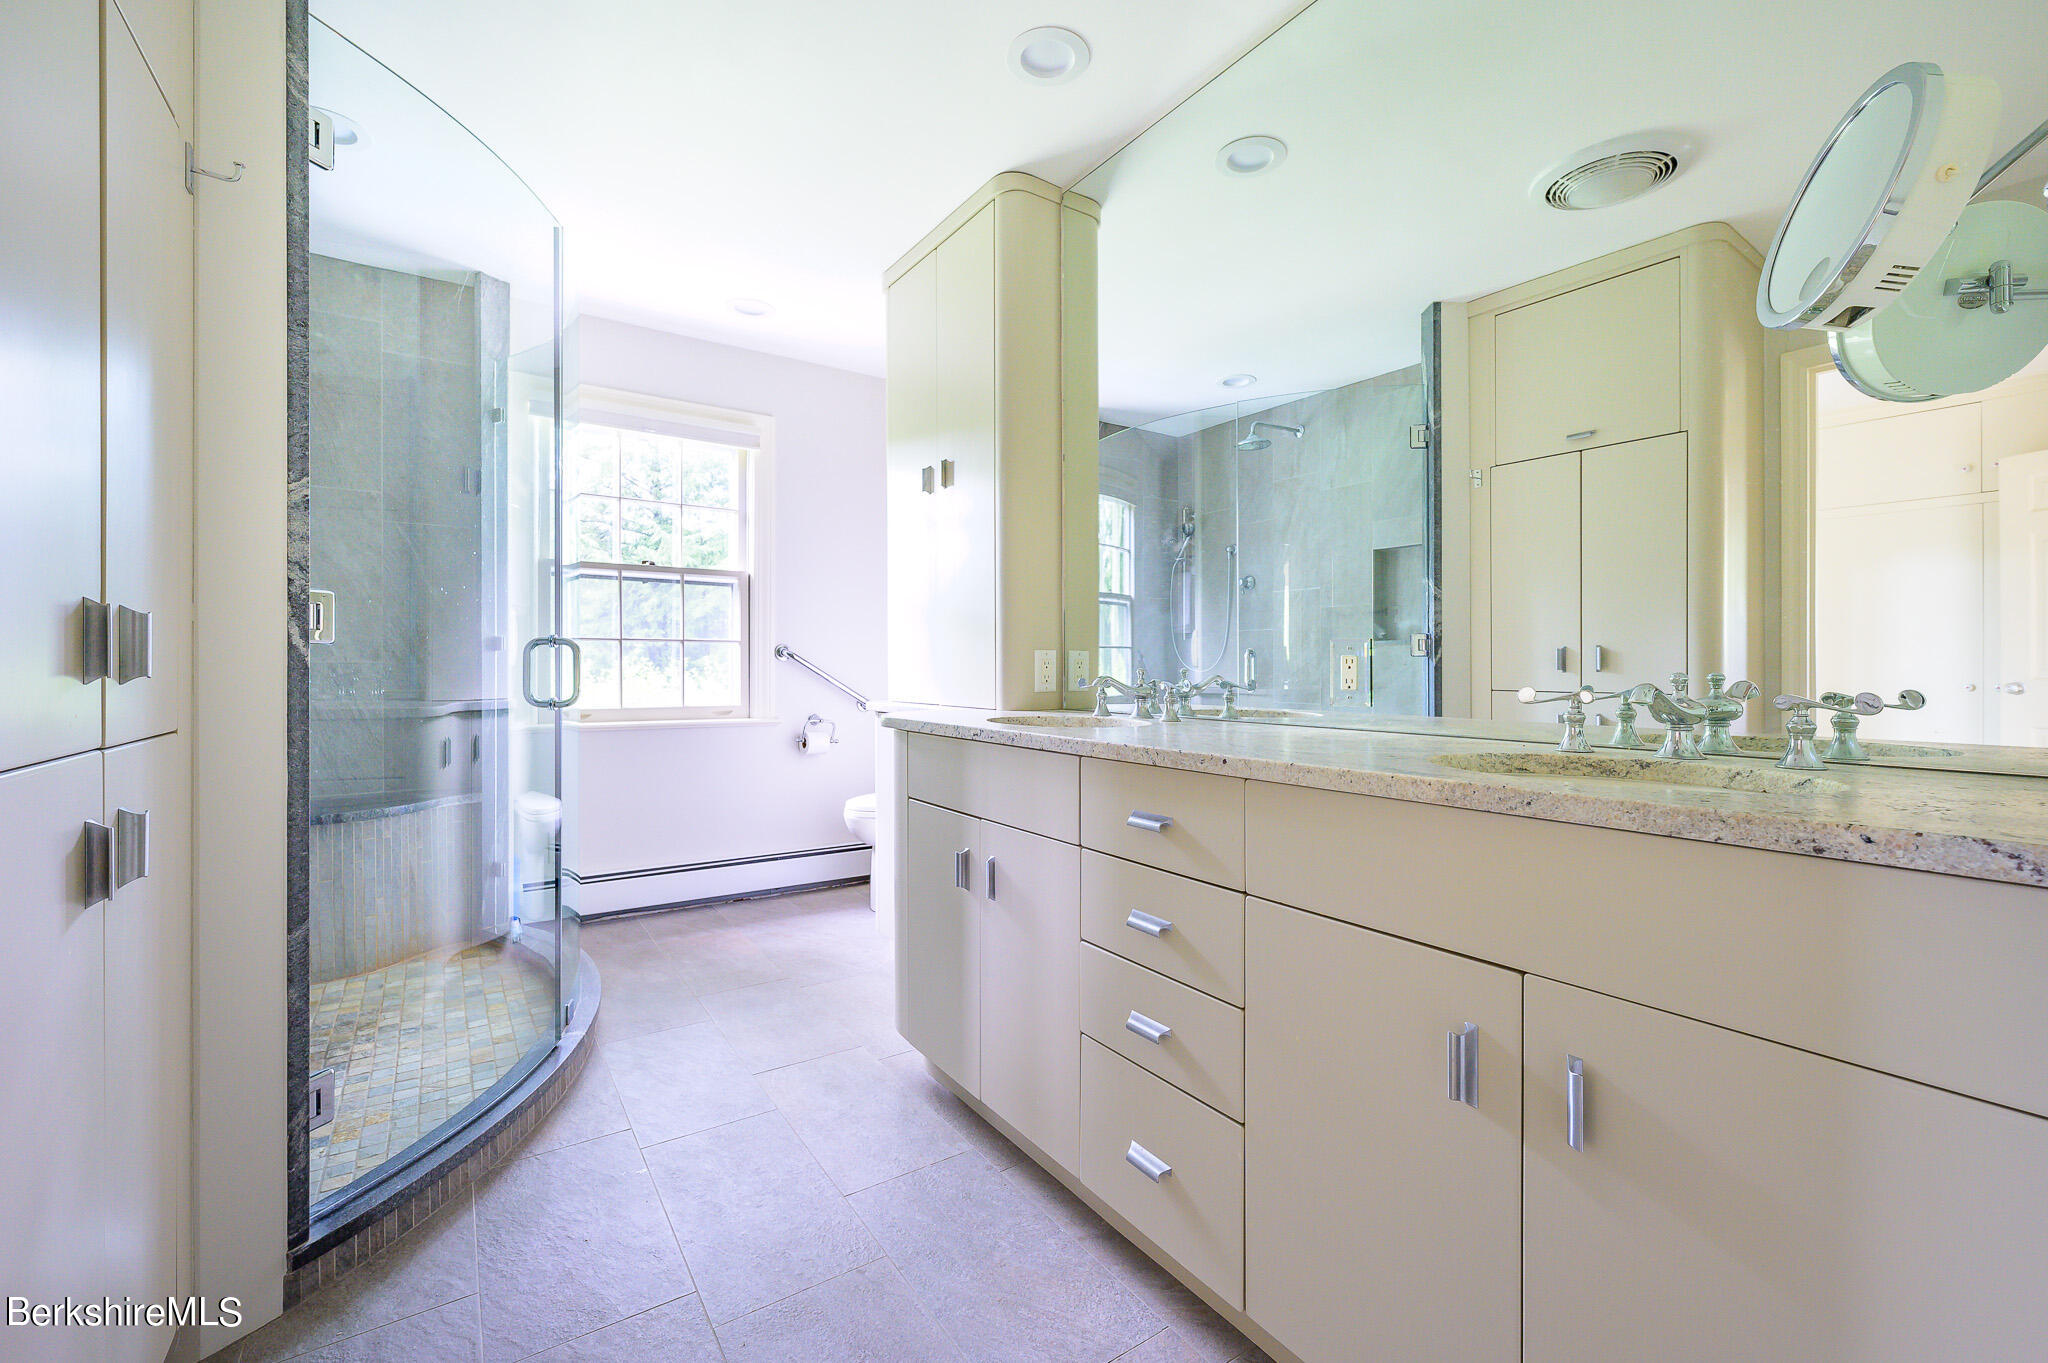 Property located at 2190 Dublin Rd Richmond MA 01254 photo